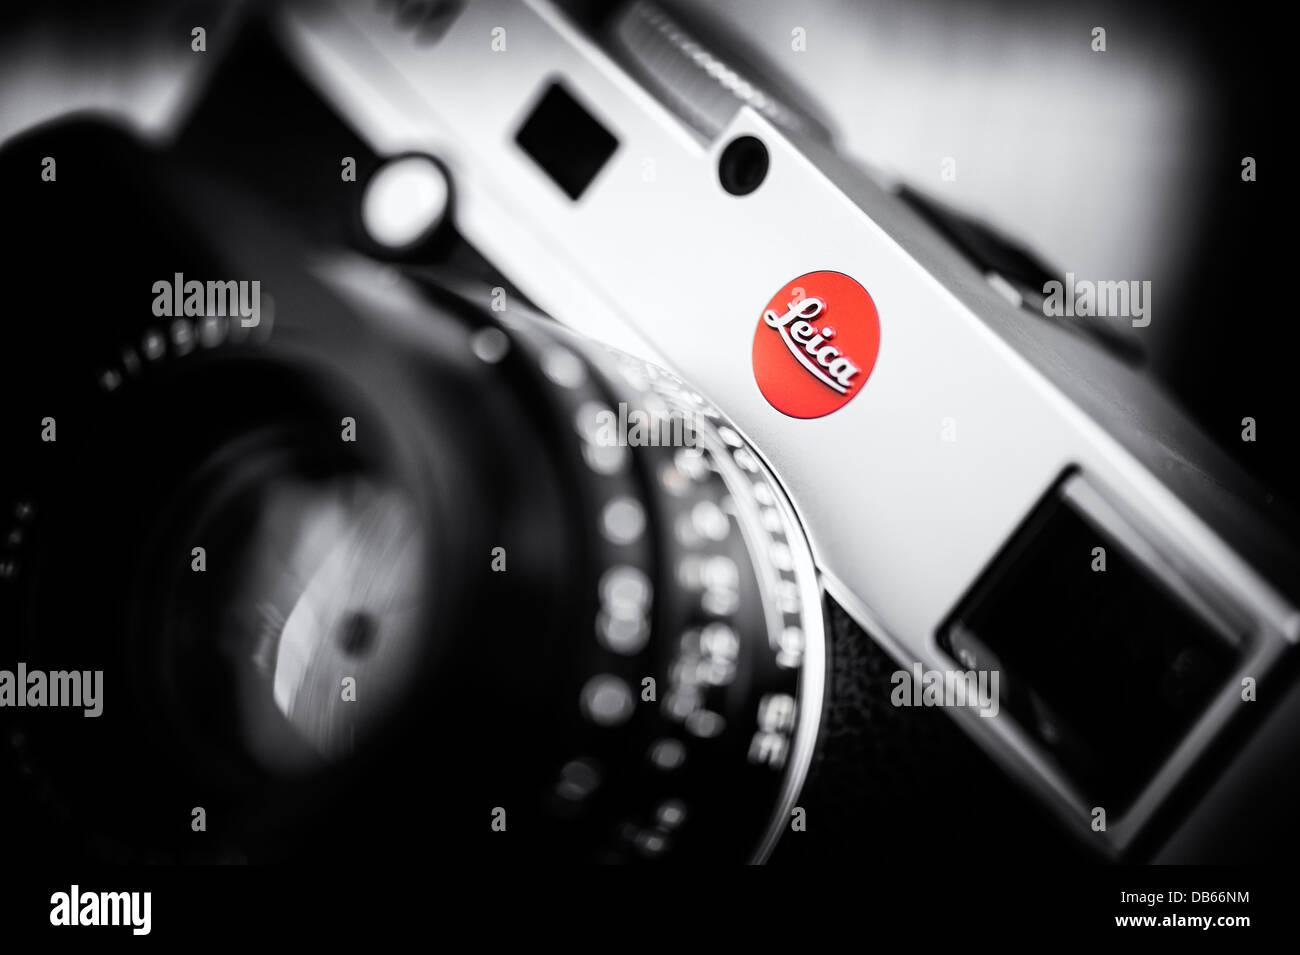 Leica Entfernungsmesser Fokos : Messsucherkamera leica m 240. selektiven fokus monochrom spot